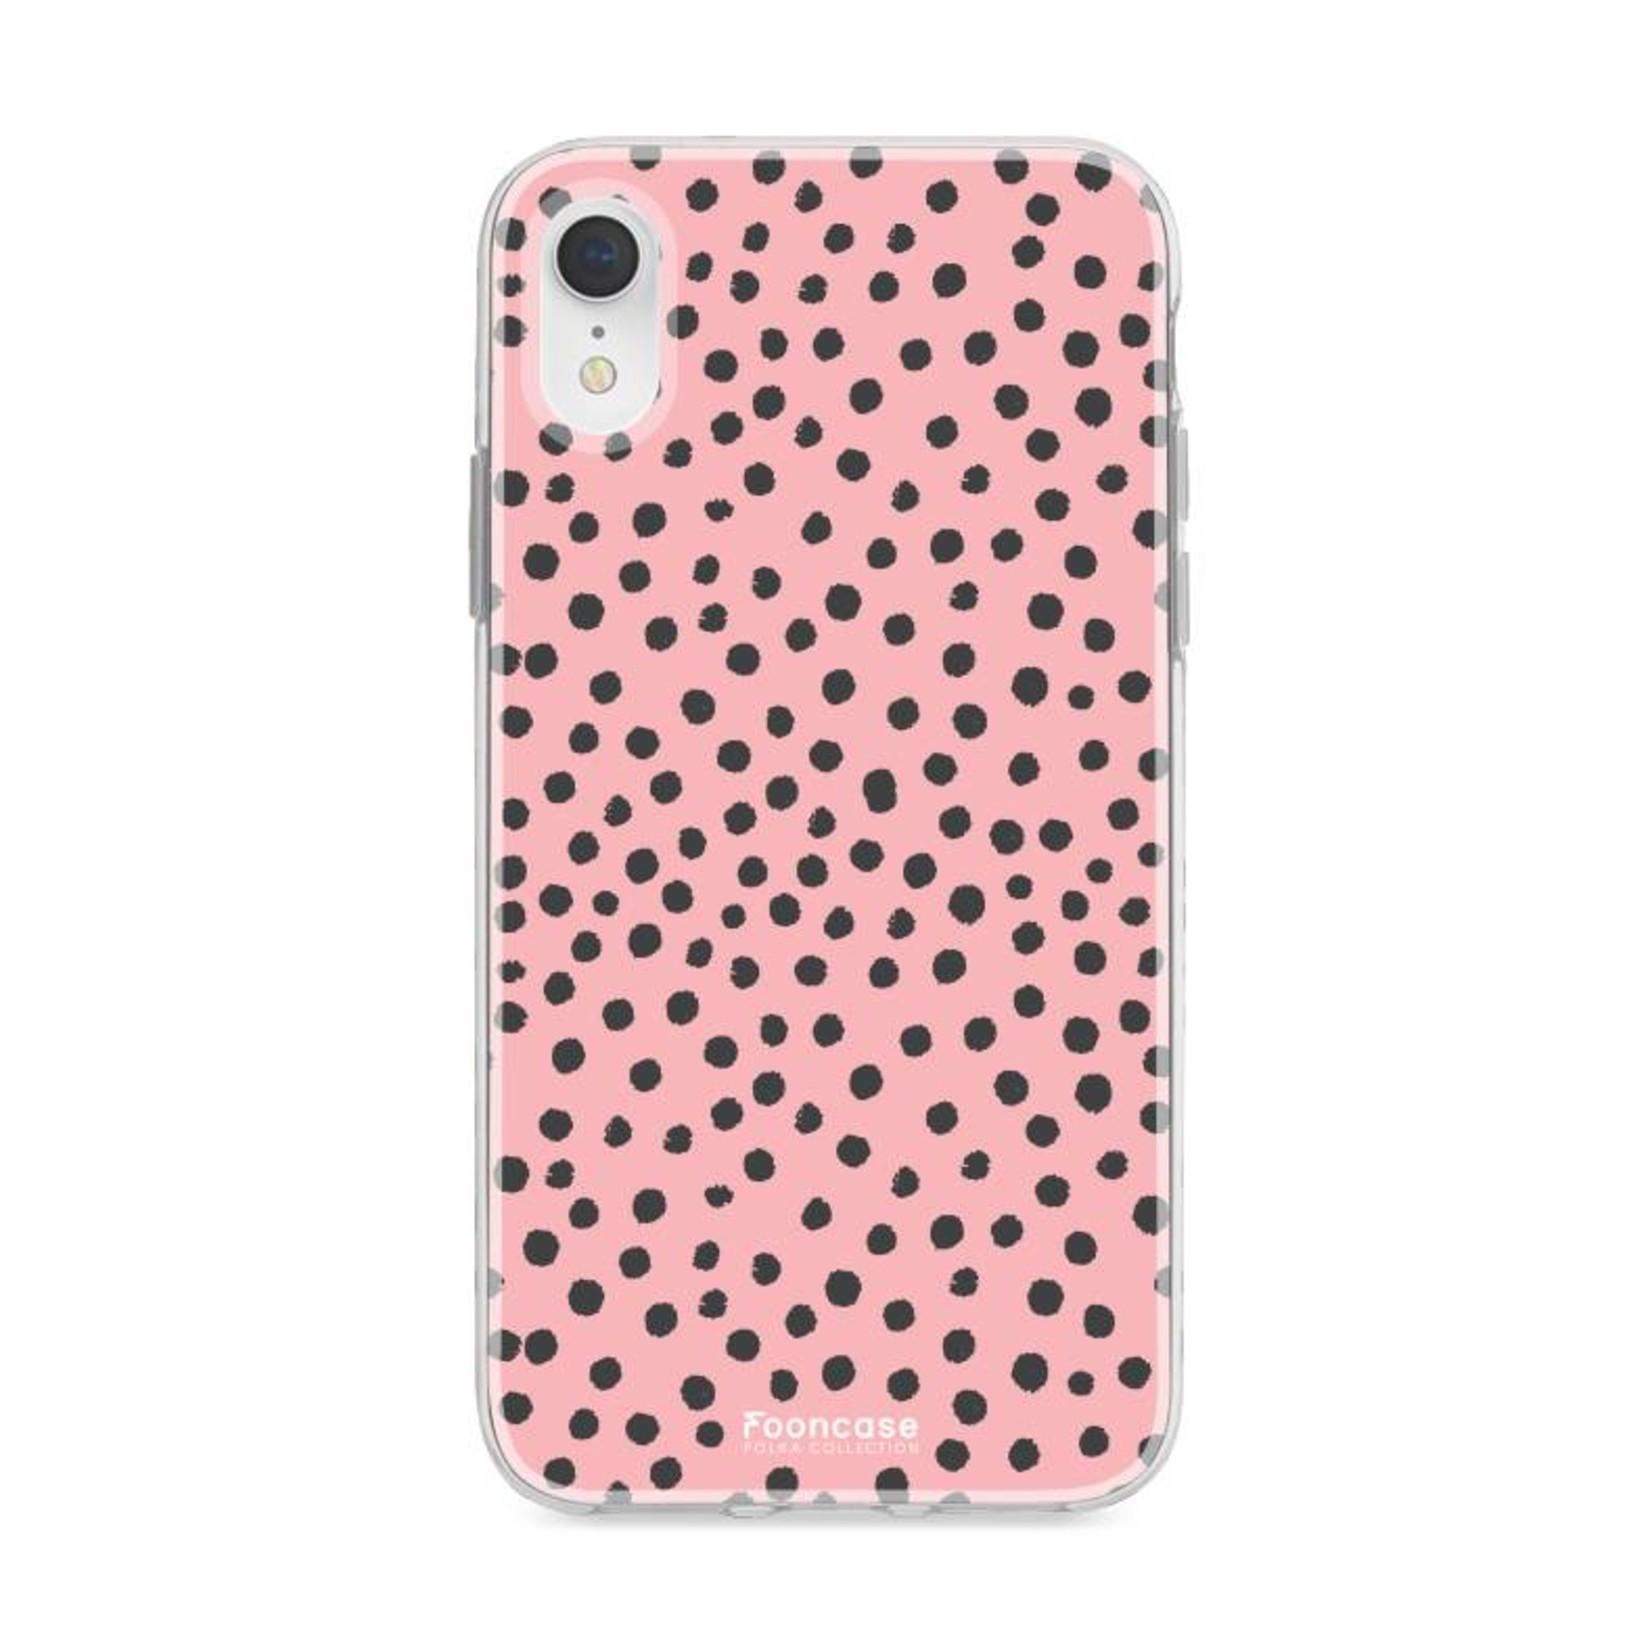 FOONCASE iPhone XR hoesje TPU Soft Case - Back Cover - POLKA COLLECTION / Stipjes / Stippen / Roze